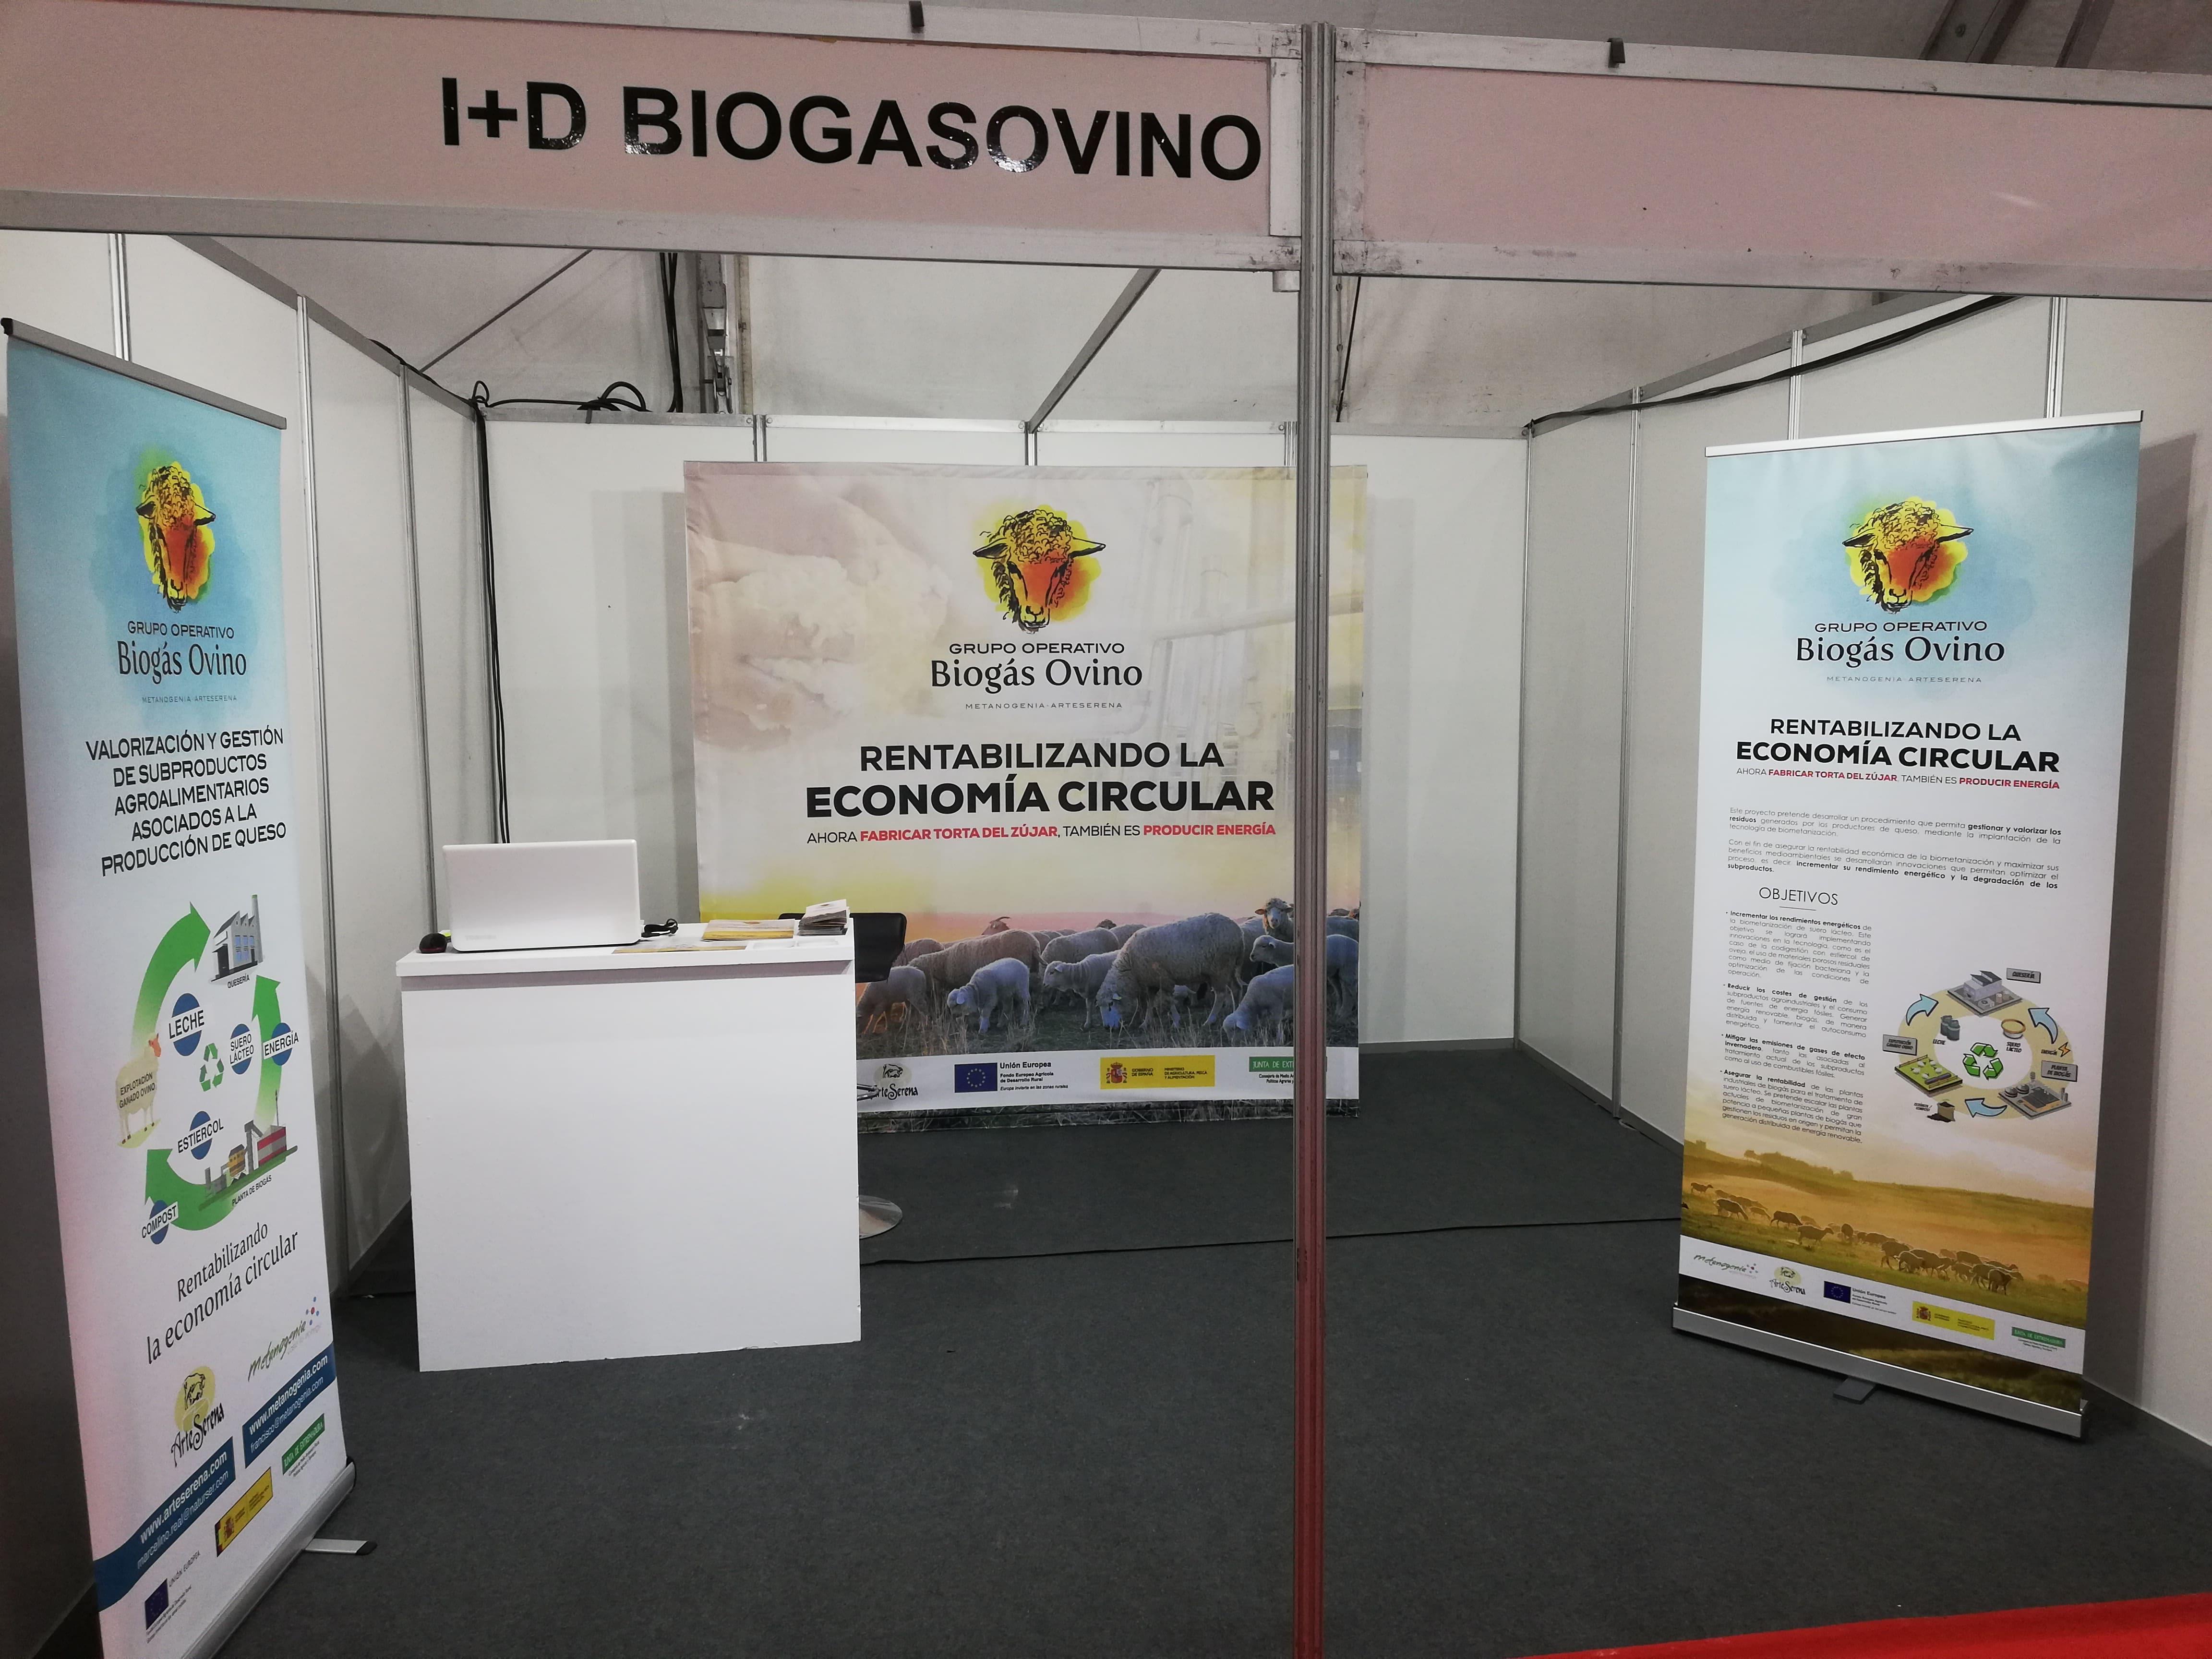 EL GRUPO OPERTATIVO BIOGÁS OVINO PRESENTE EN LA FERIA INTERNACIONAL AGROEXPO